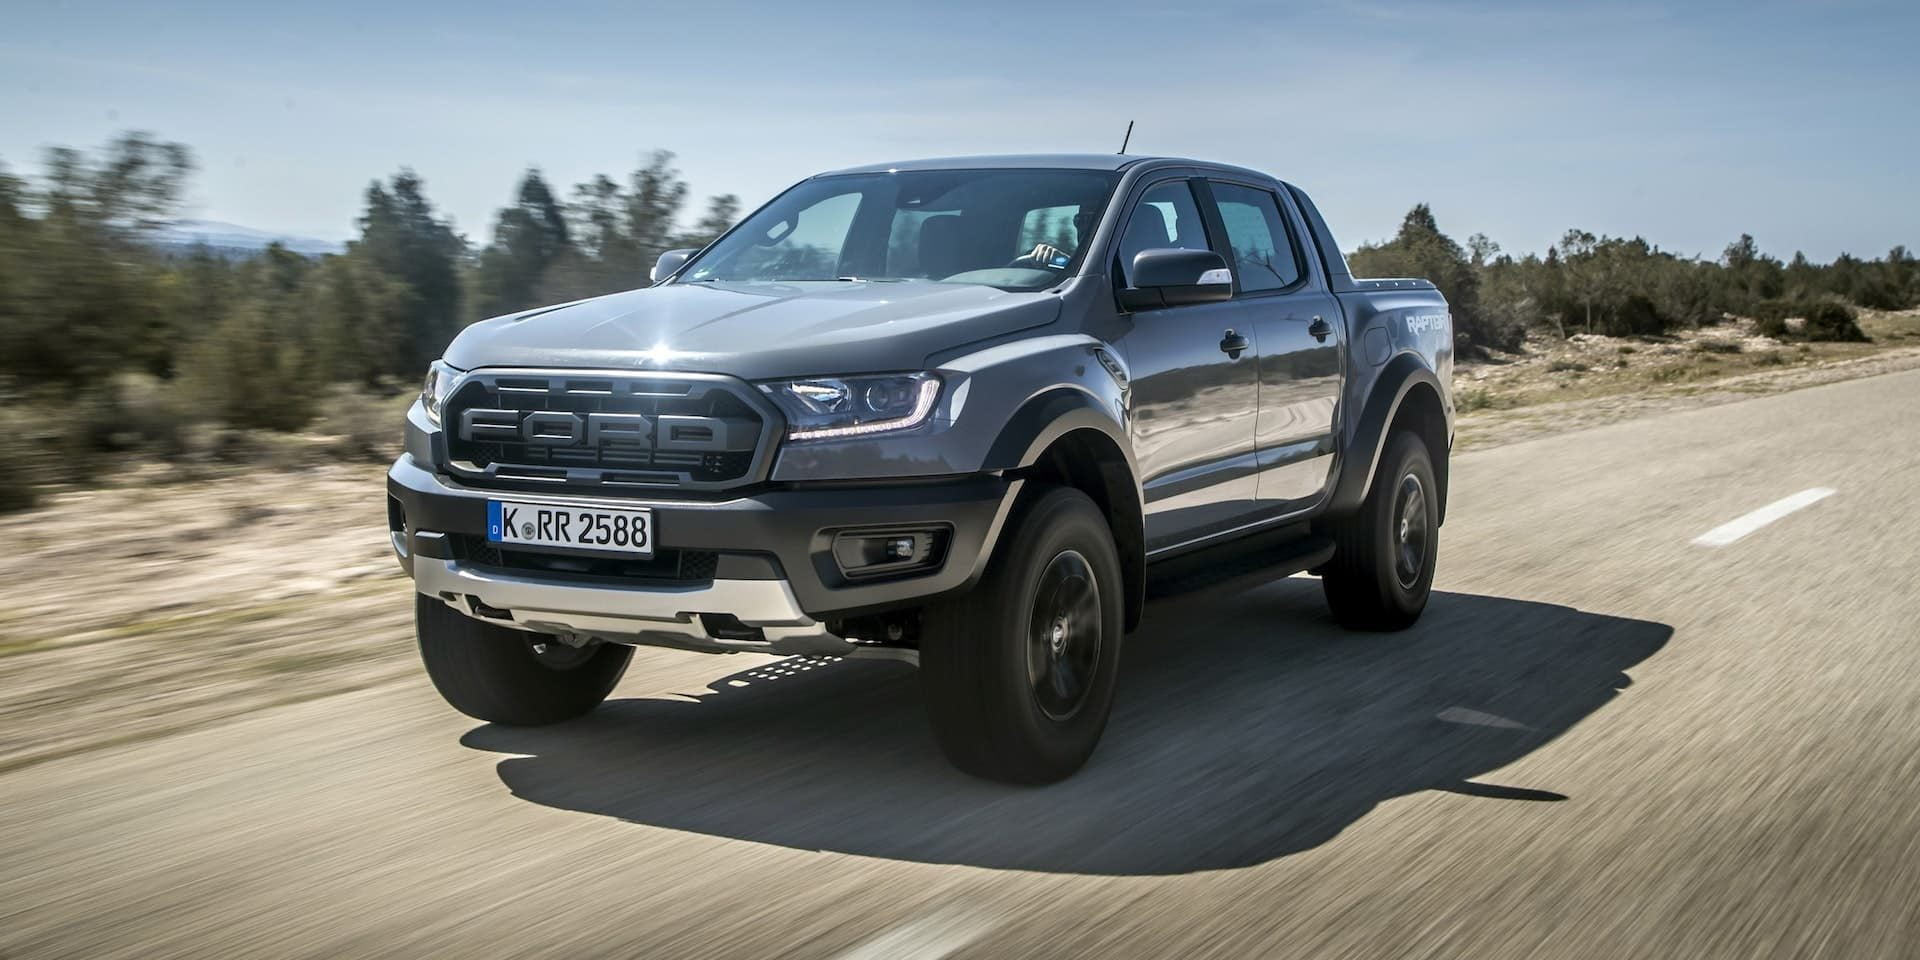 Ford Ranger Raptor test drive 2019 | The Van Expert